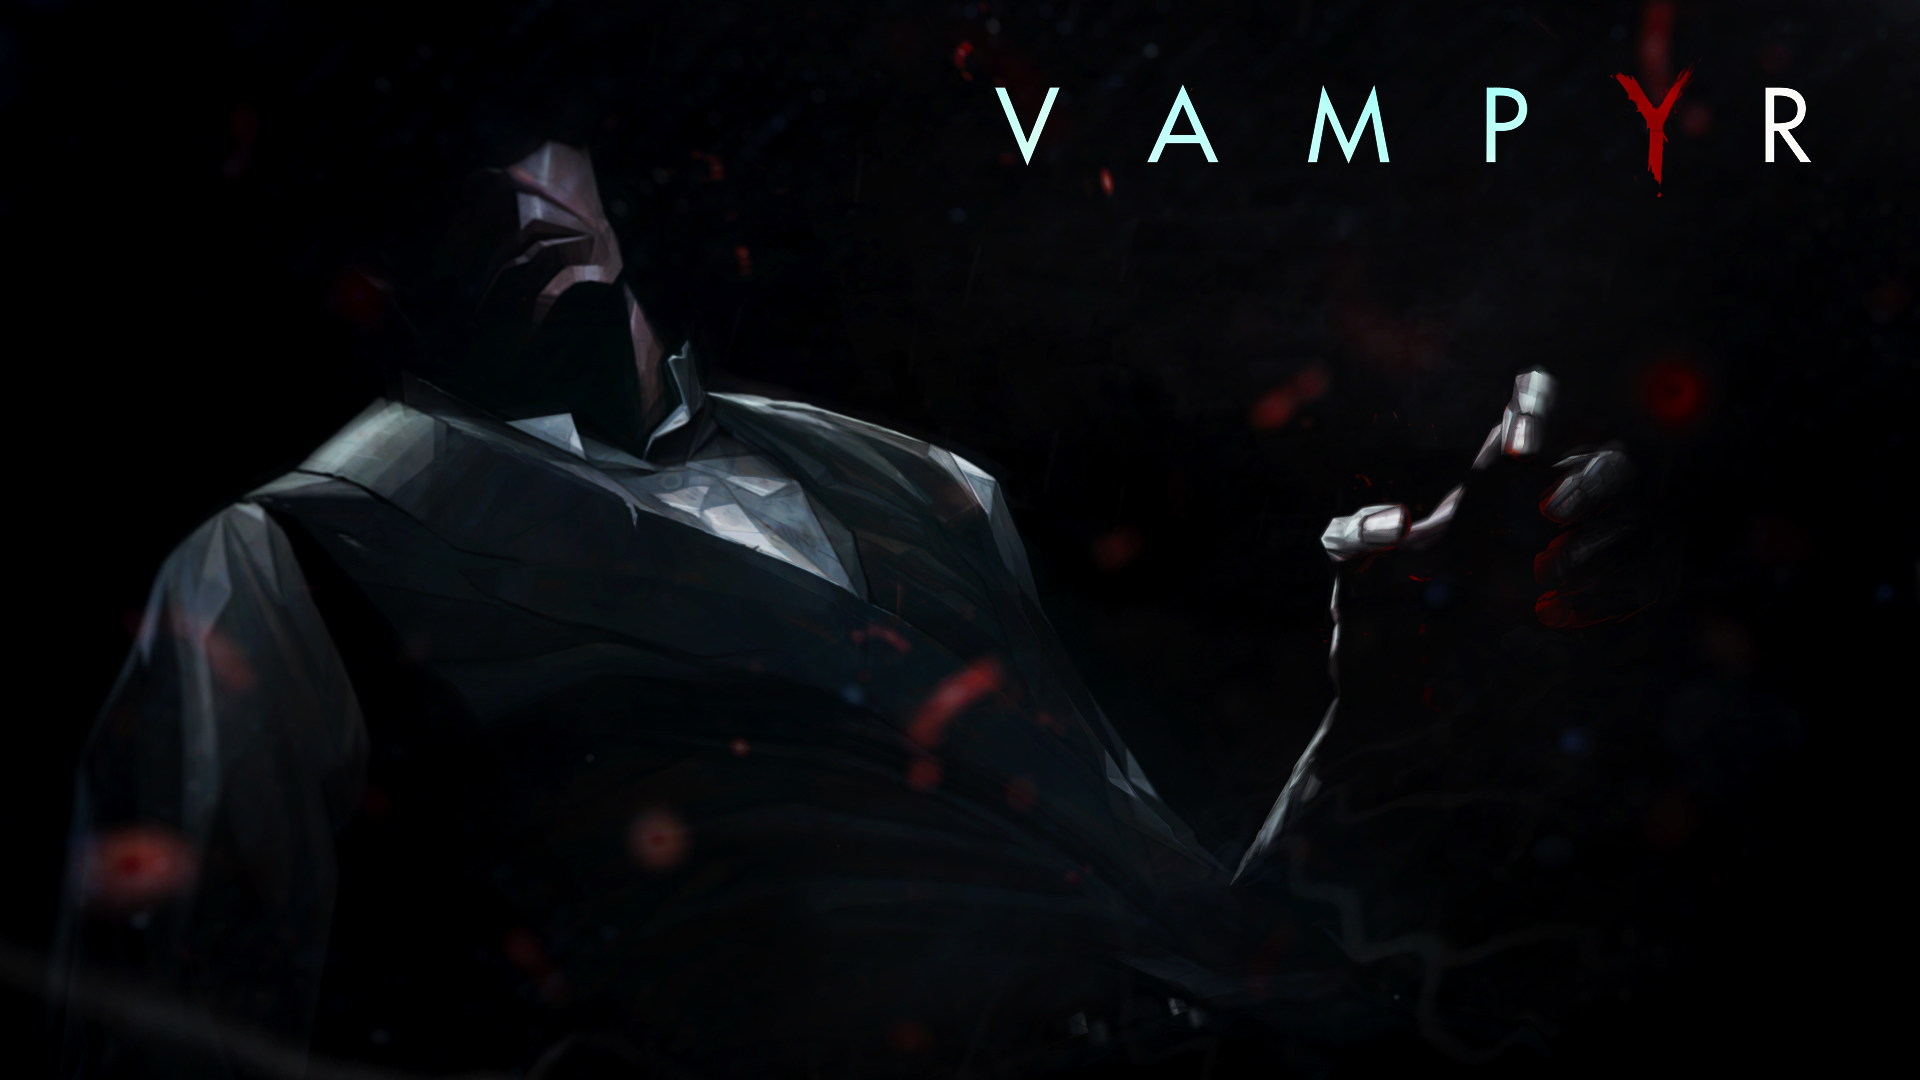 General 1920x1080 Vampyr video games game art dark Games posters